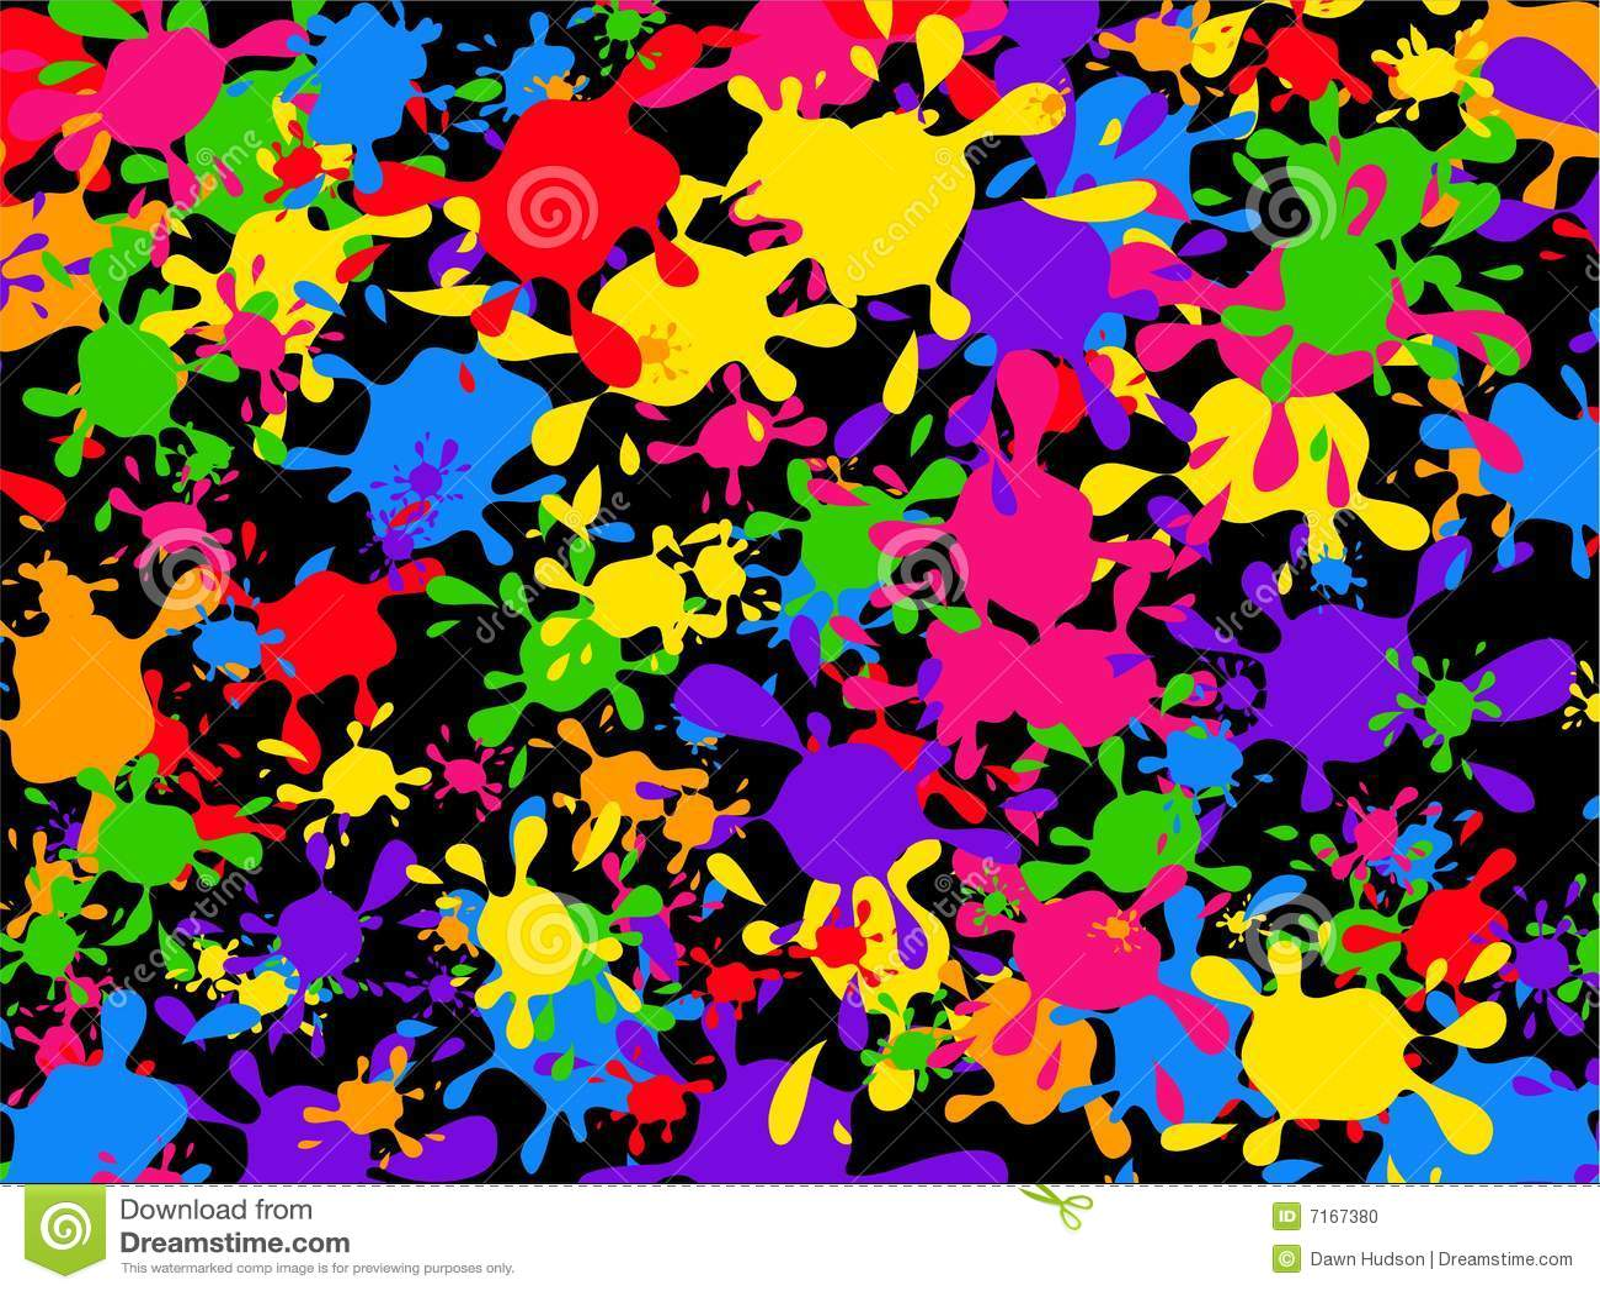 splatter paint wallpaper royalty free stock image - image: 37058656